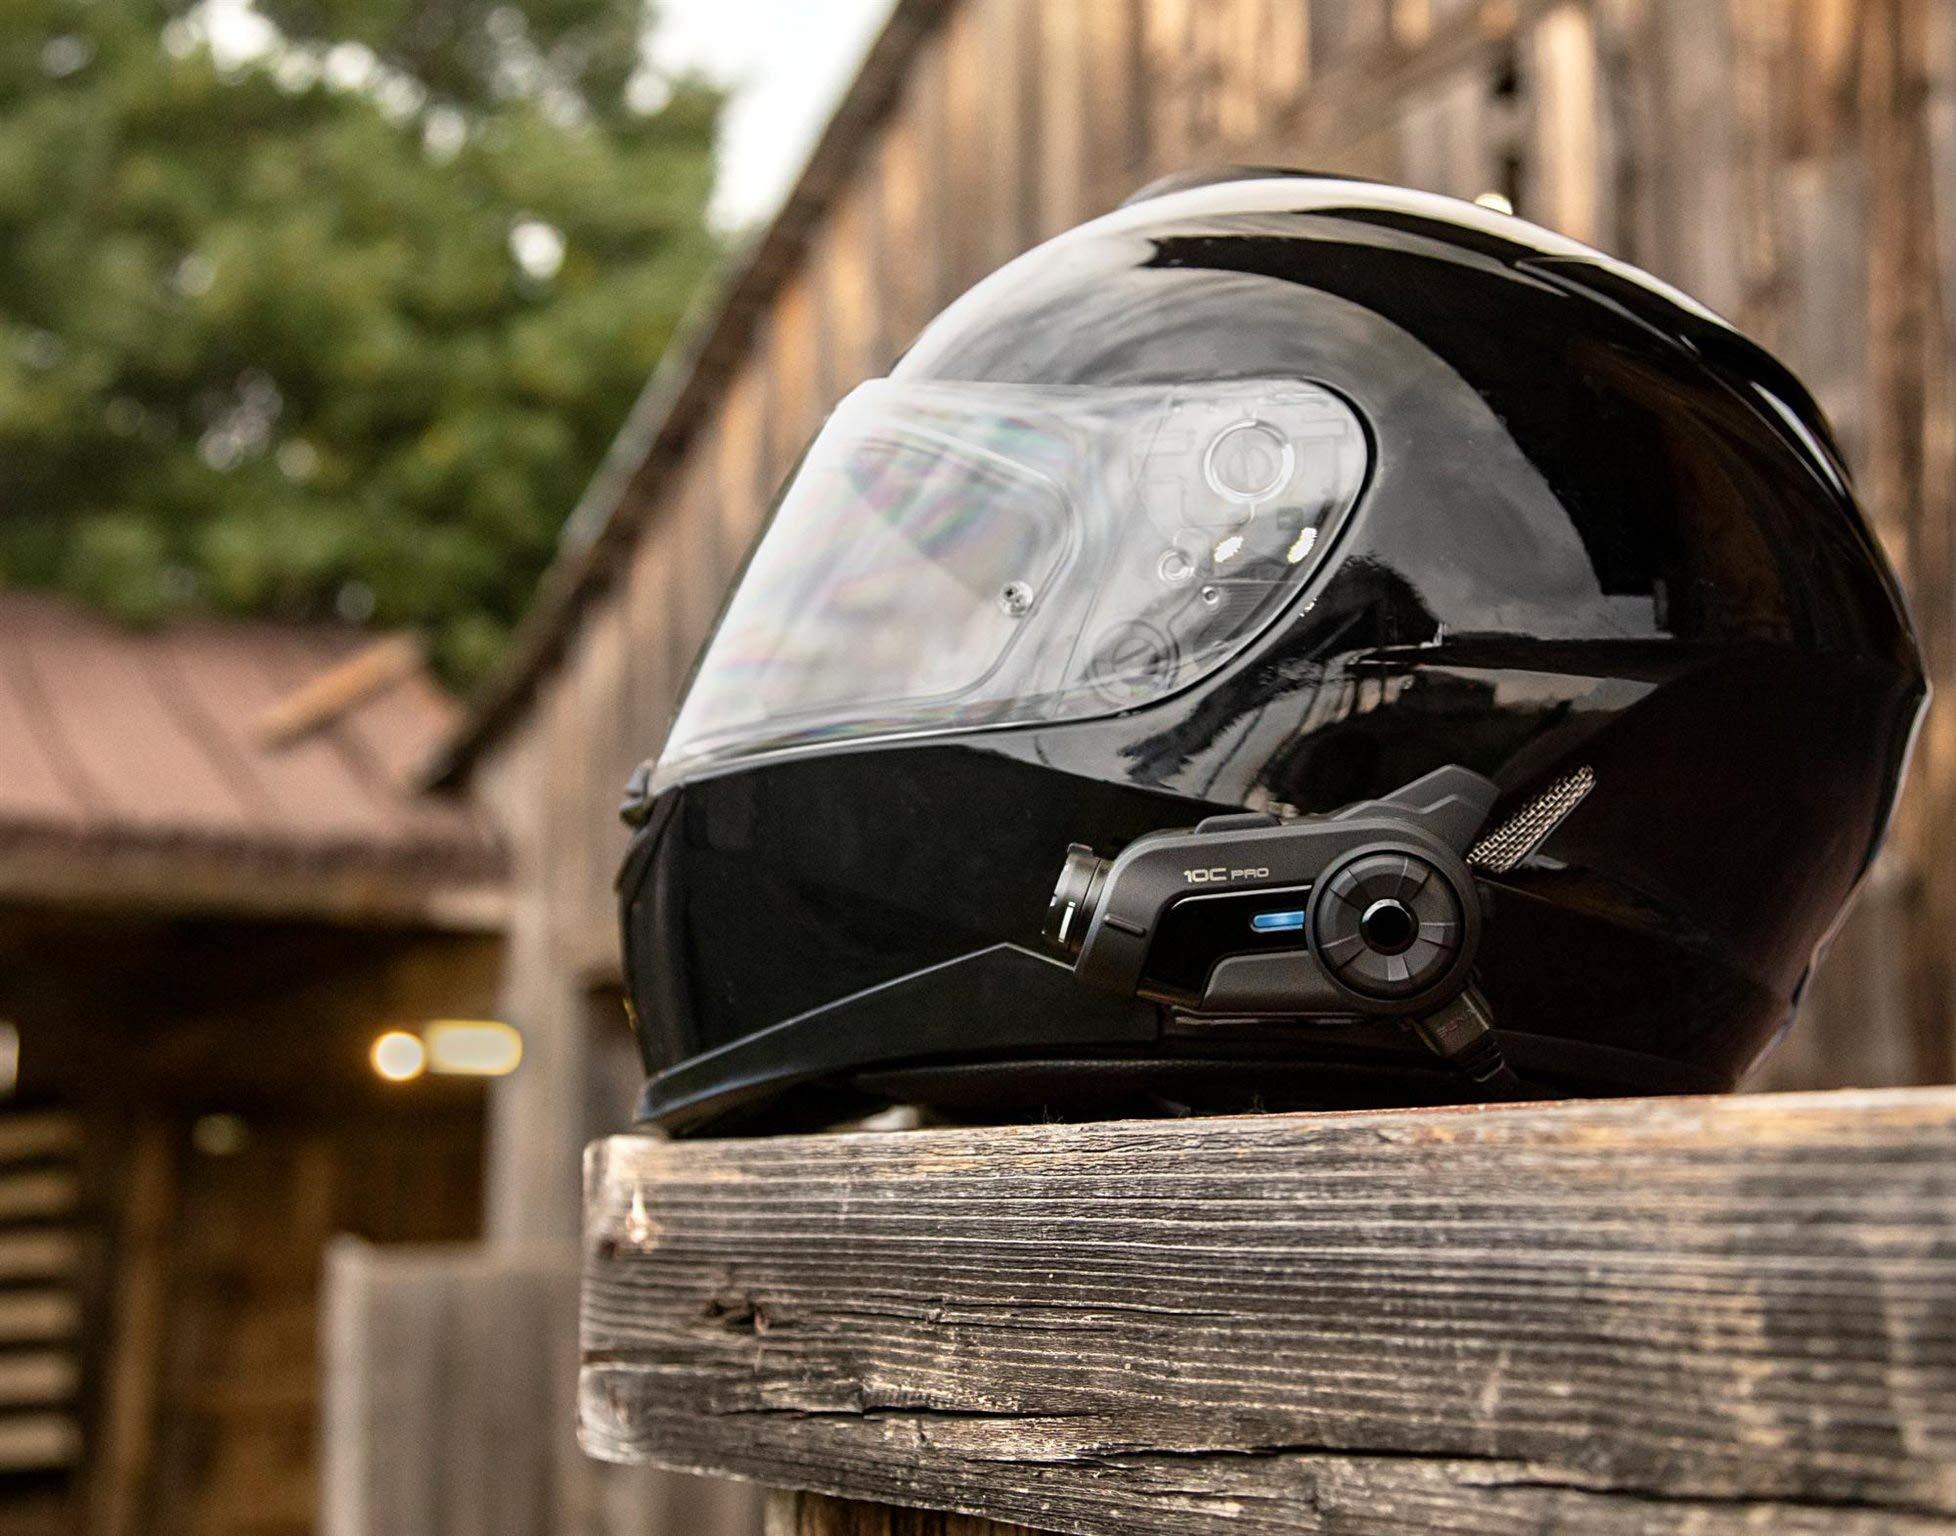 Sena 10C Pro Communication System Helmet Accessories